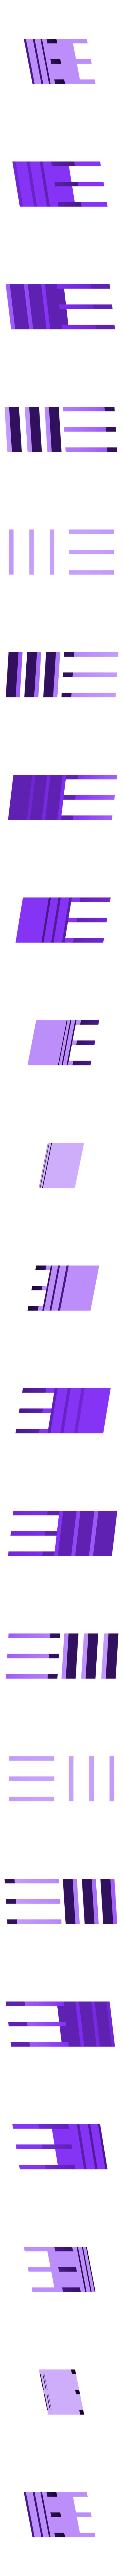 kettle_grip_logo.STL Download free STL file Multi-Color Kettle • 3D printable design, MosaicManufacturing